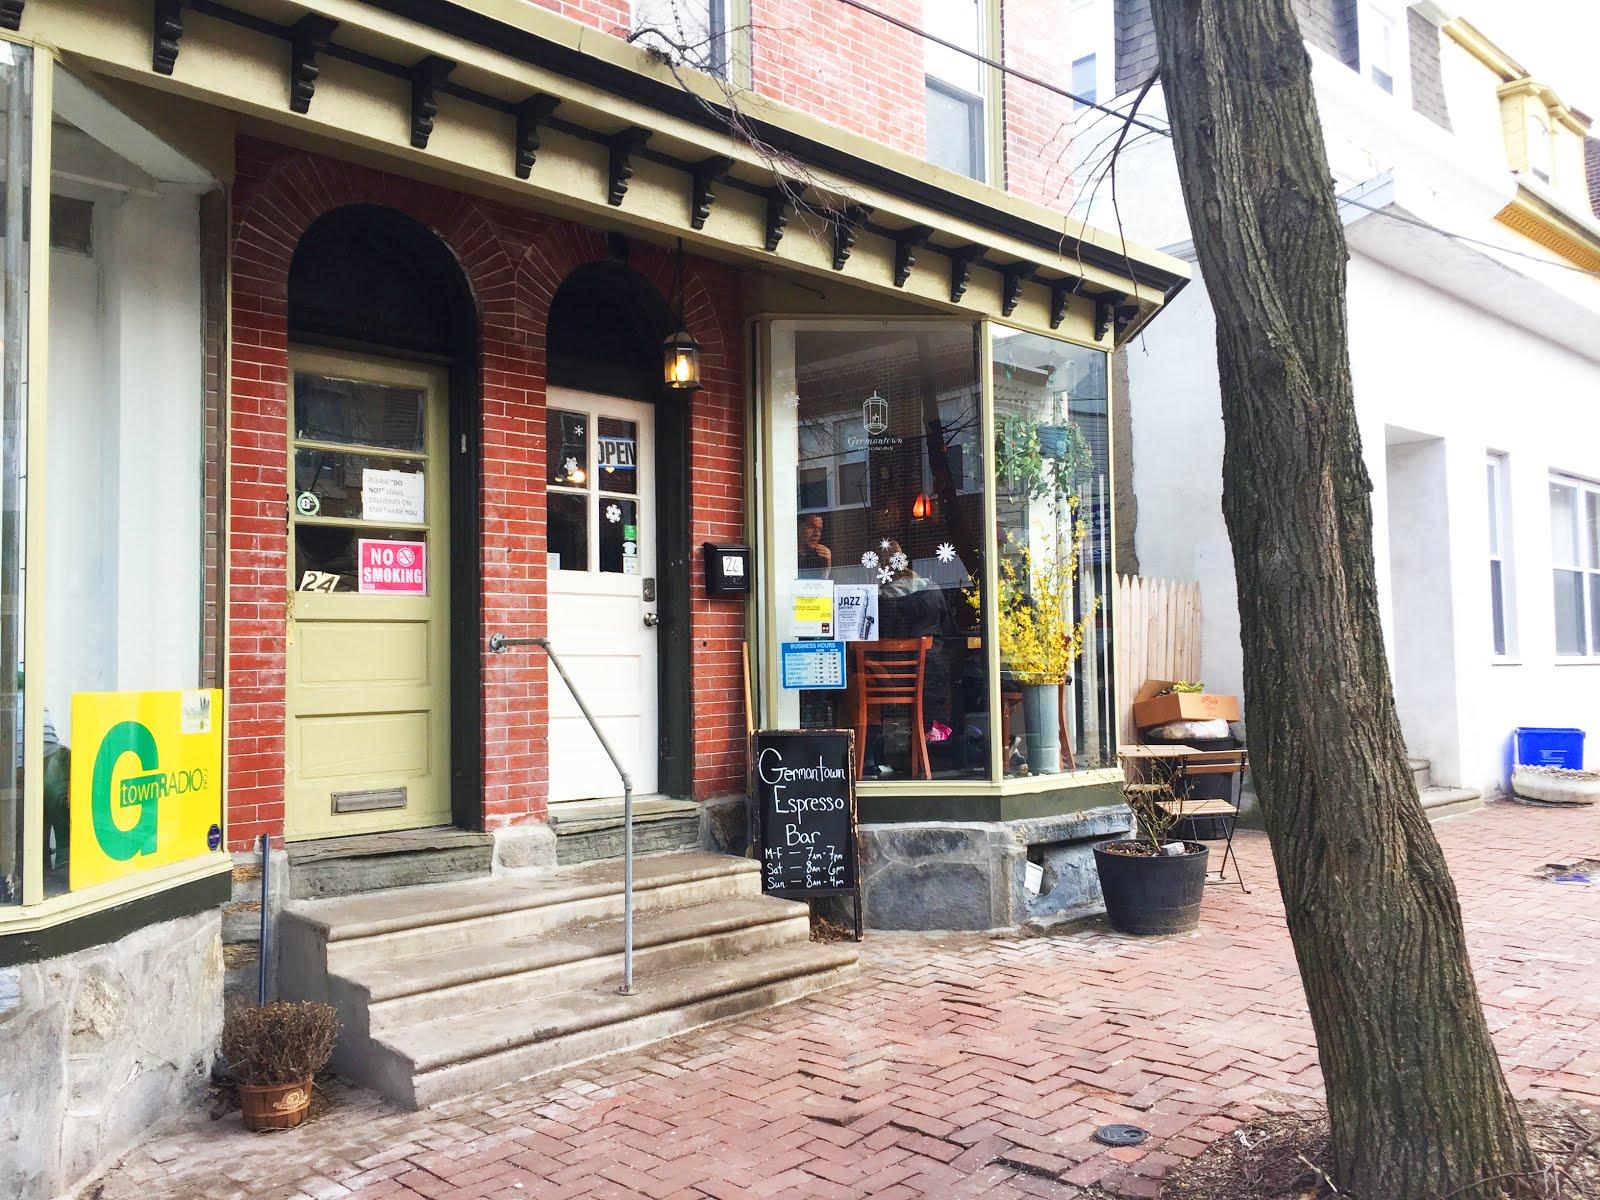 Germantown Espresso Bar